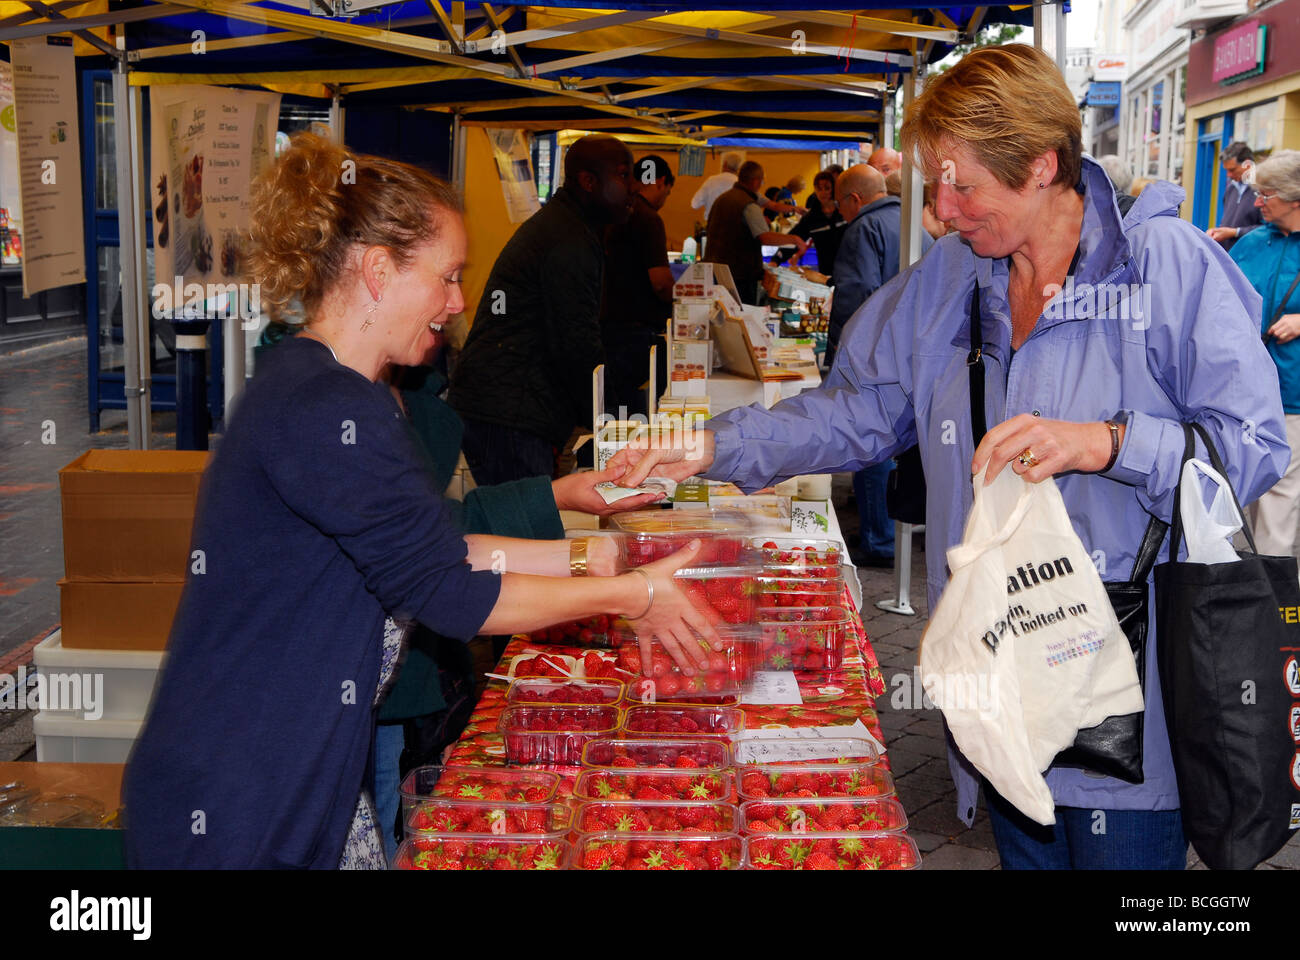 Alton Food Festival 2009, Alton, Hampshire, UK. - Stock Image